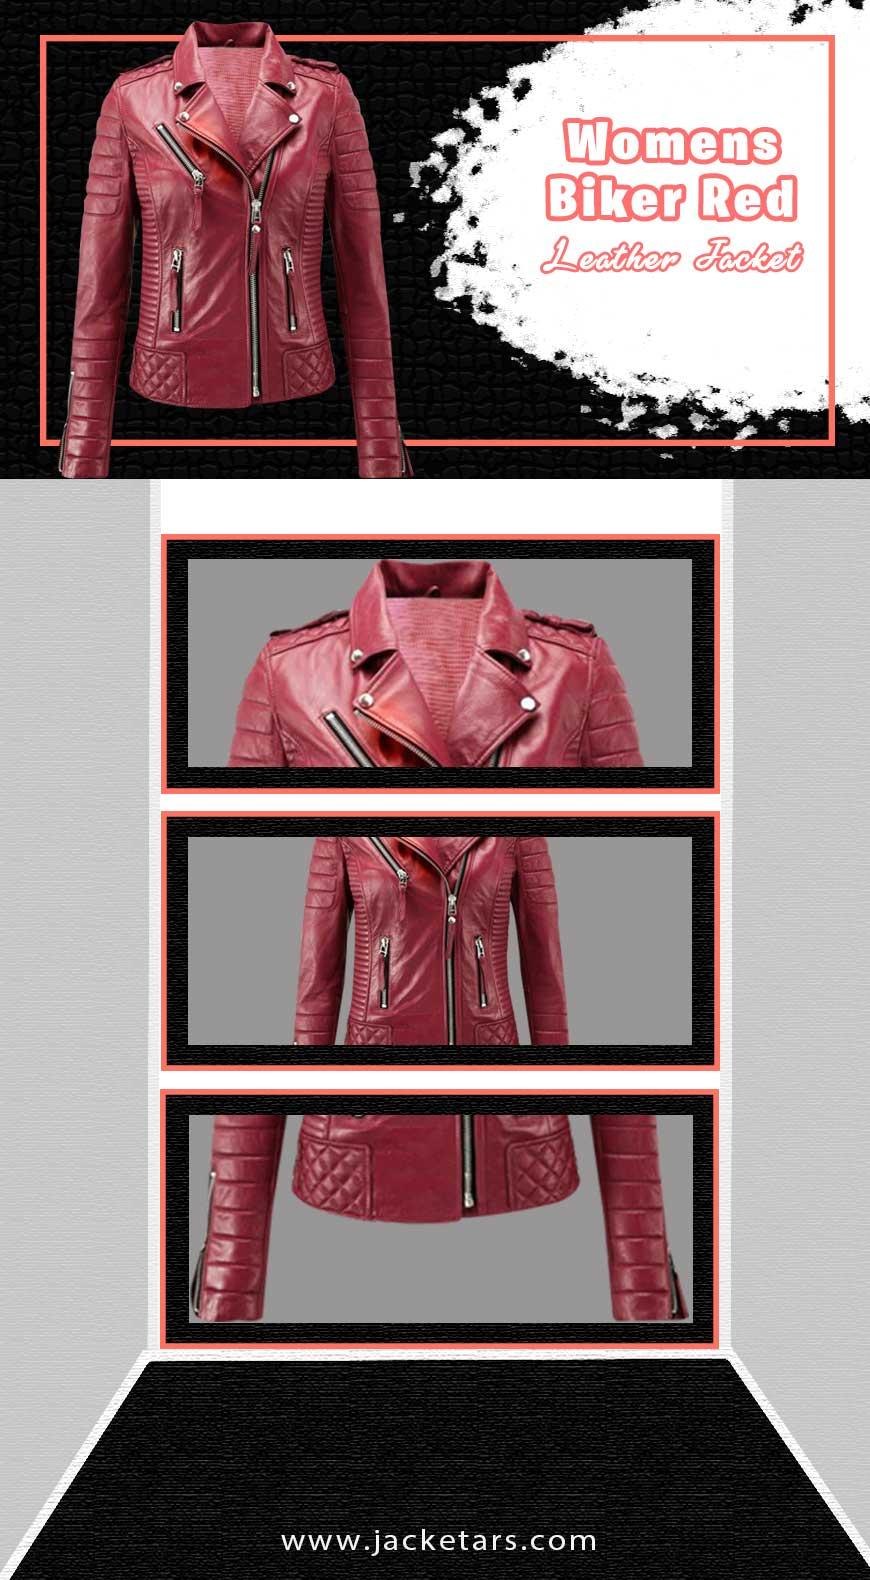 Womens Biker Red Leather Jacket info